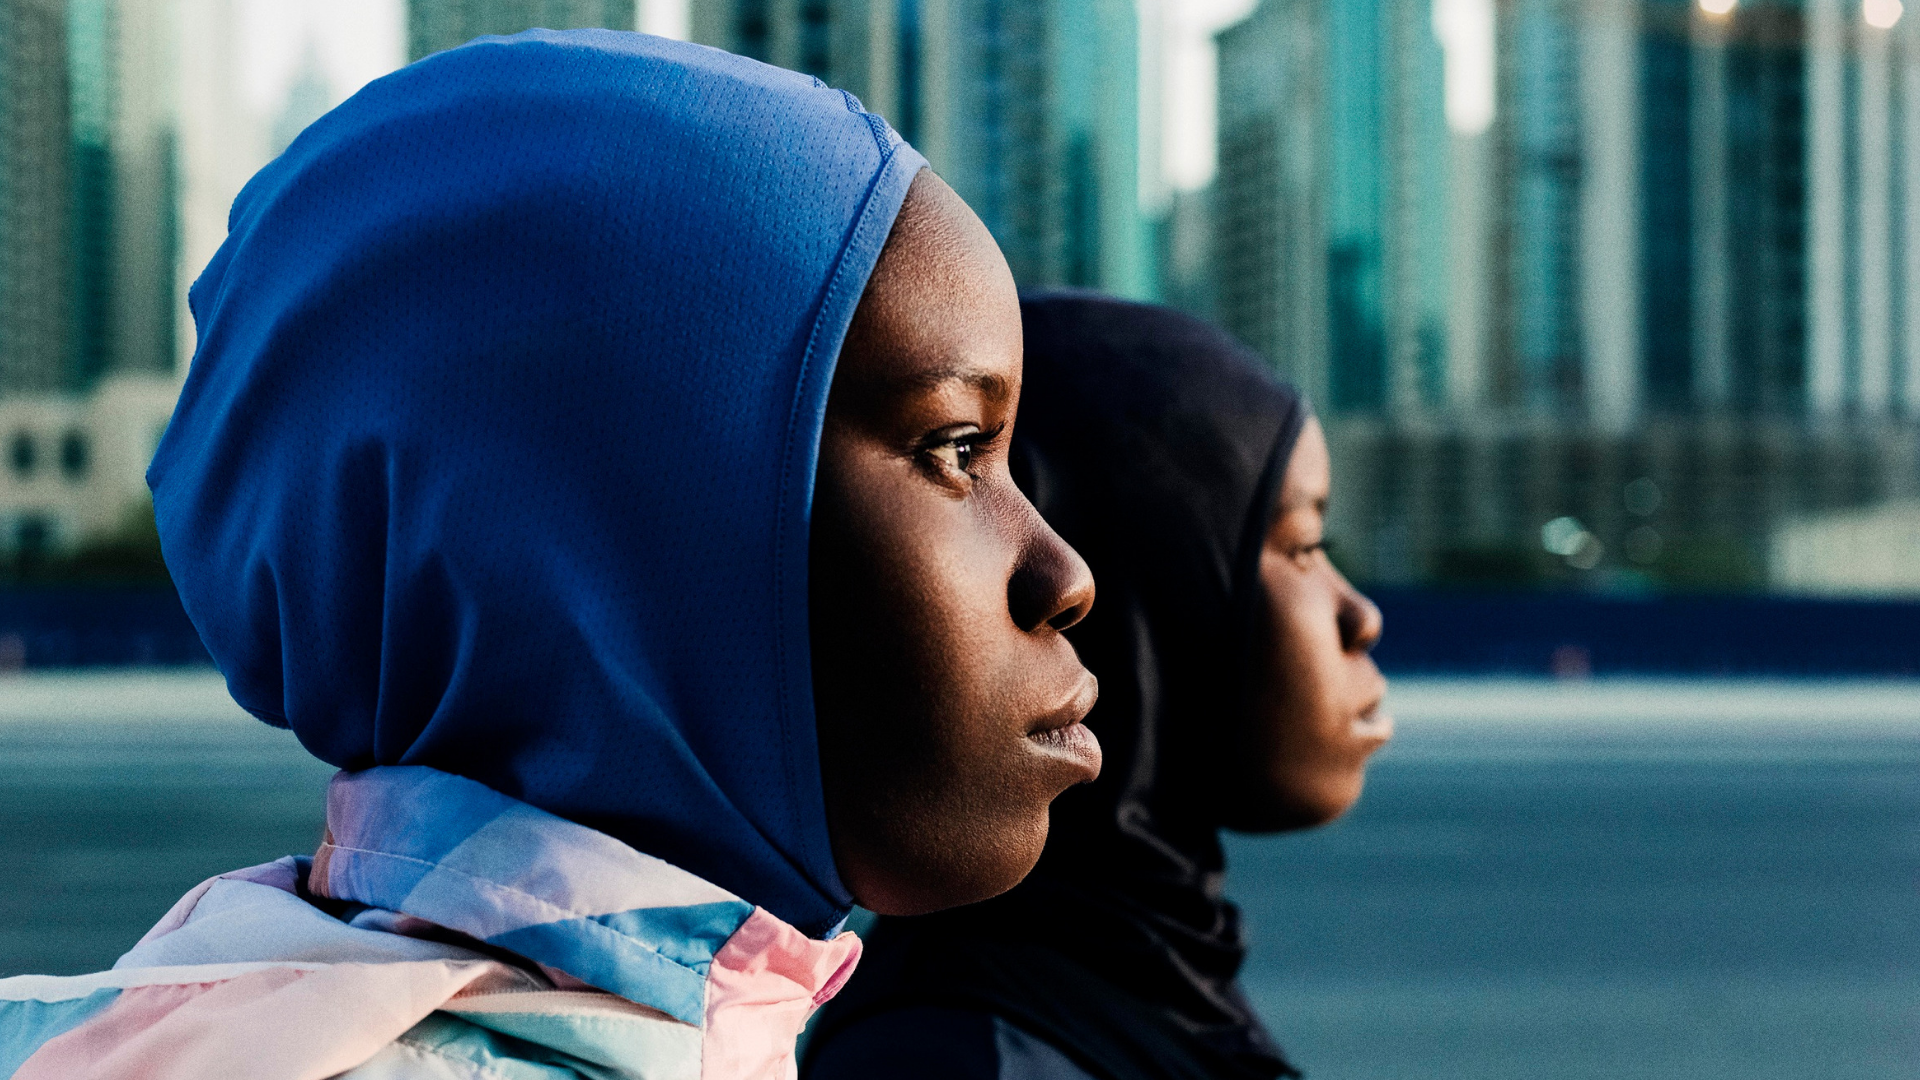 semáforo patrulla Oso  Nike Middle East Campaign Features Dubai's Young Athletes | Harper's BAZAAR  Arabia